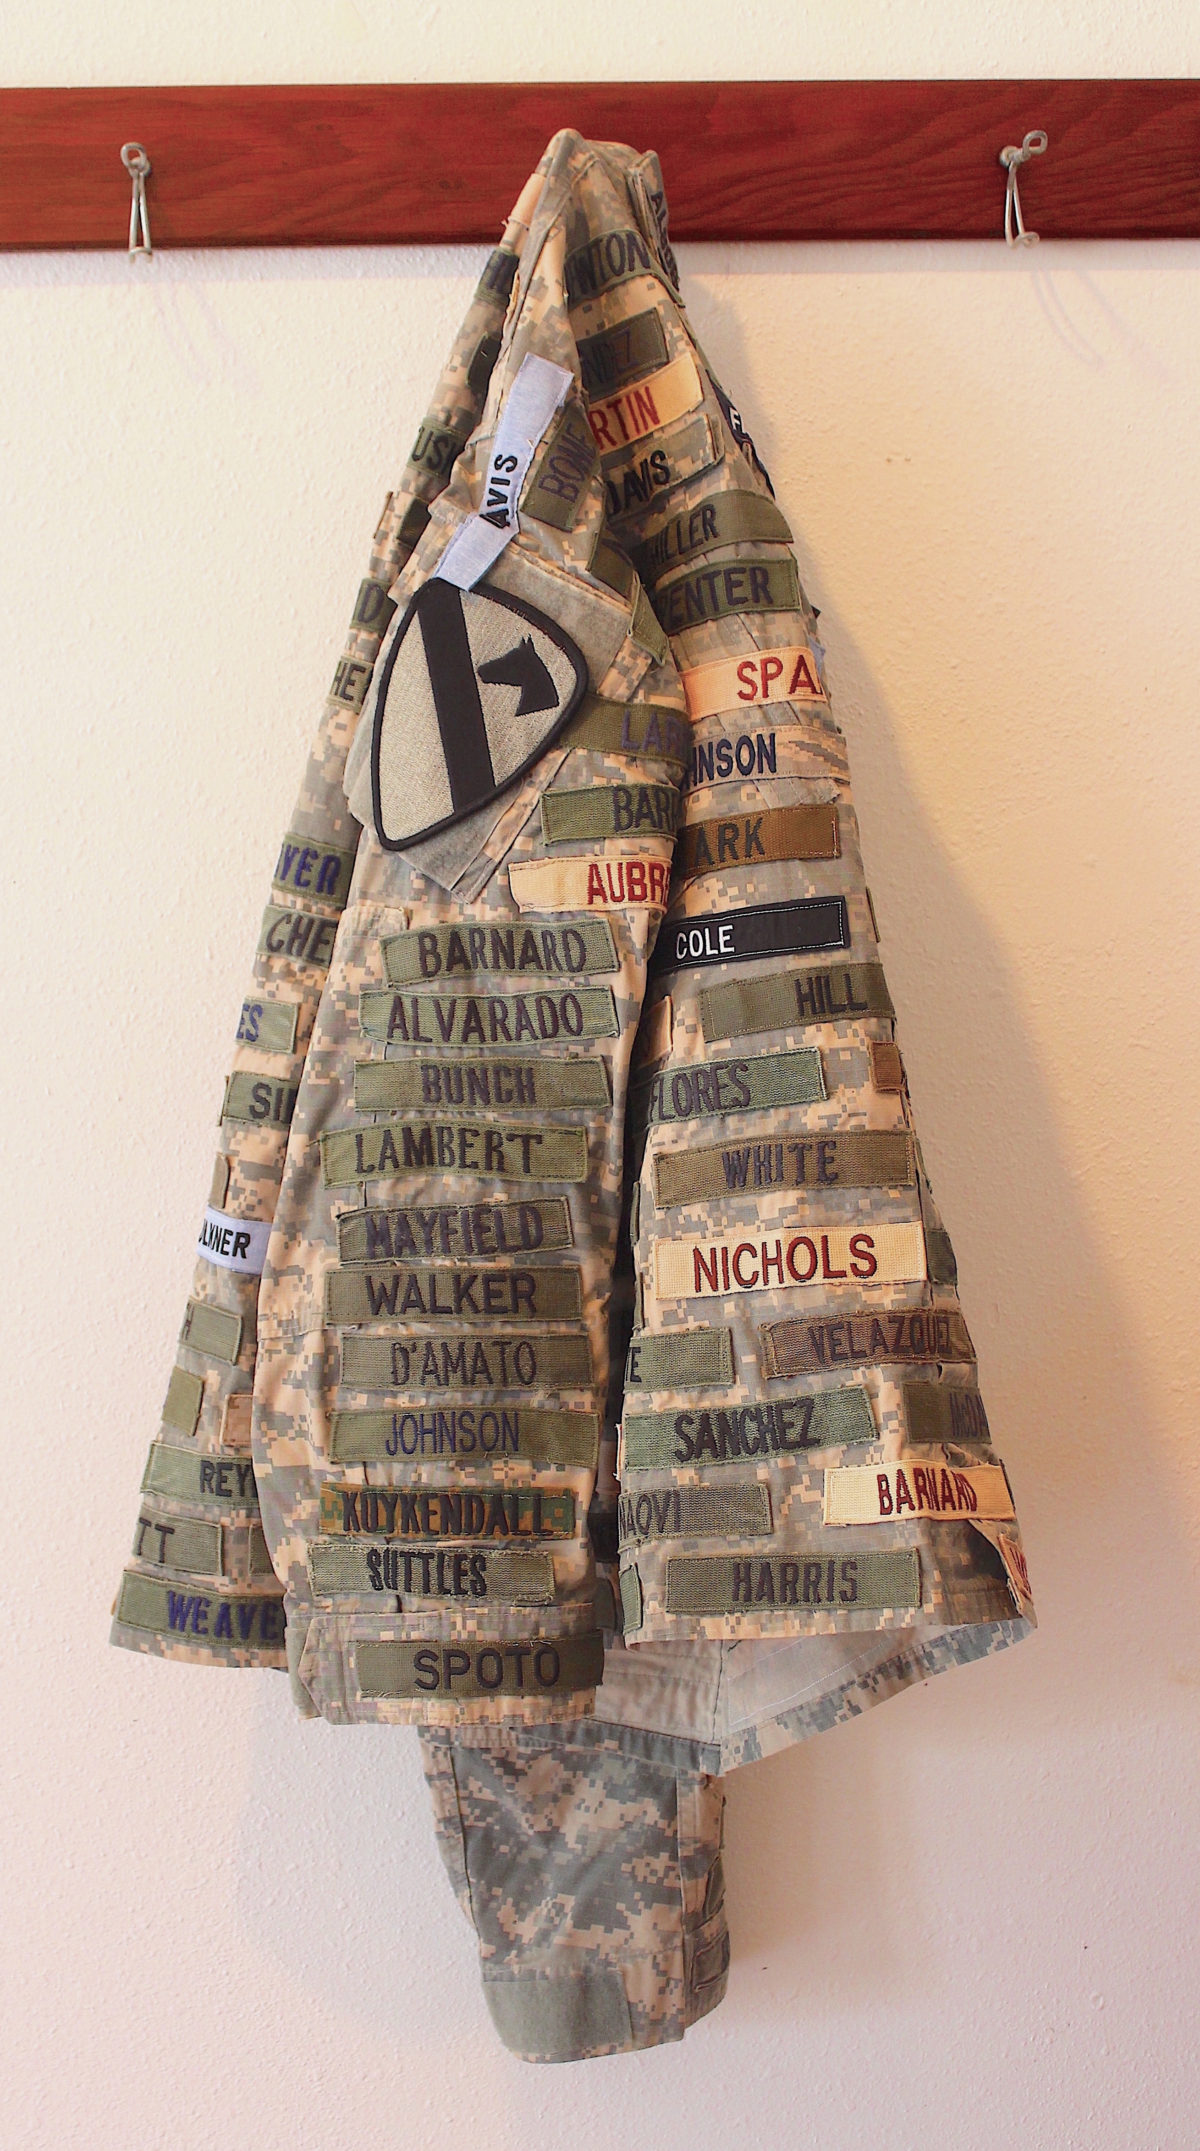 Soldier's Jacket, Mixed Media, Maria-Cristina Jadick